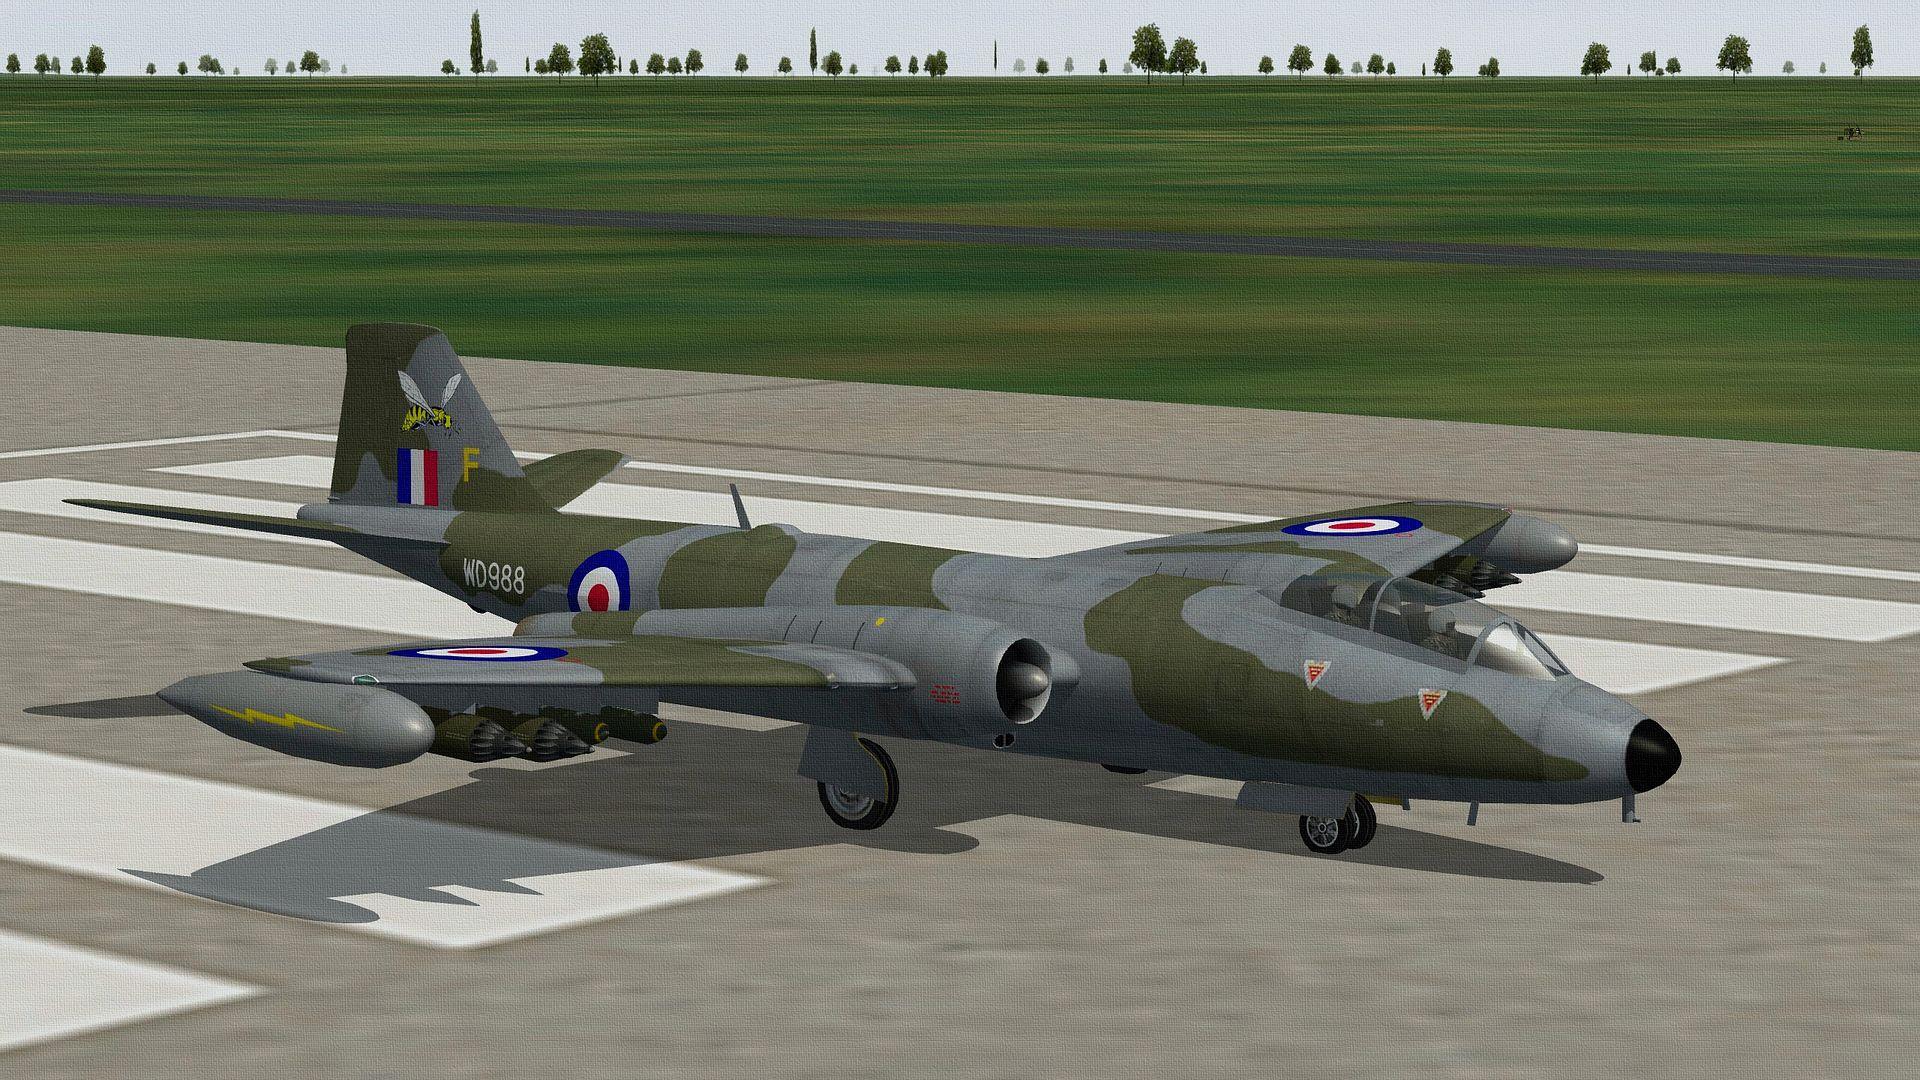 RAF%20CANBERRA%20B5.02_zpsr87qjnyp.jpg